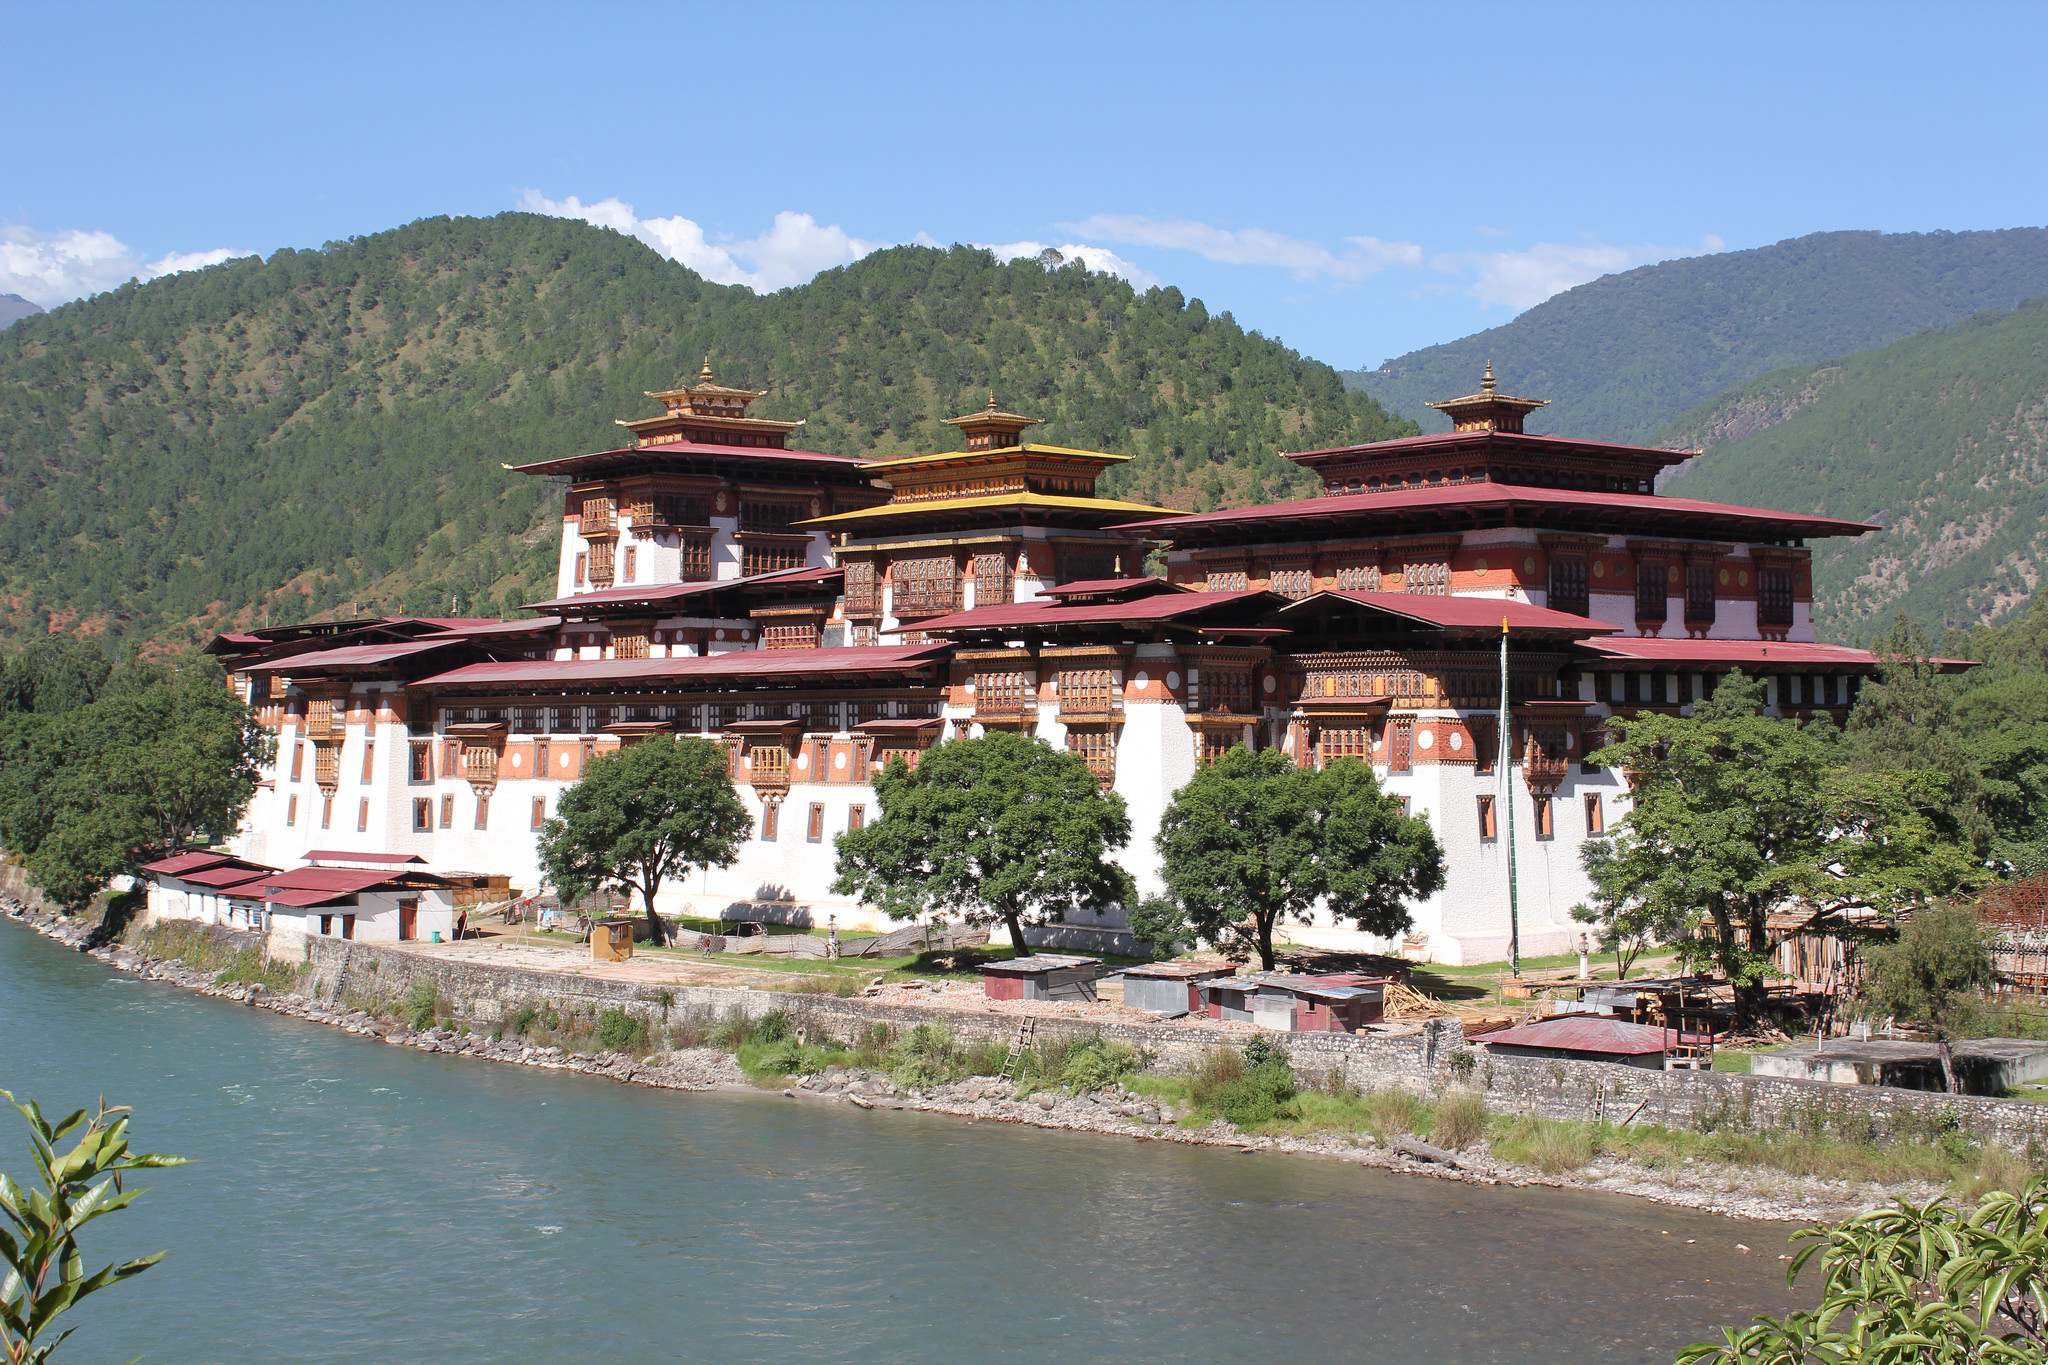 bhutan6 Bhutan   The Land of the Thunder Dragon